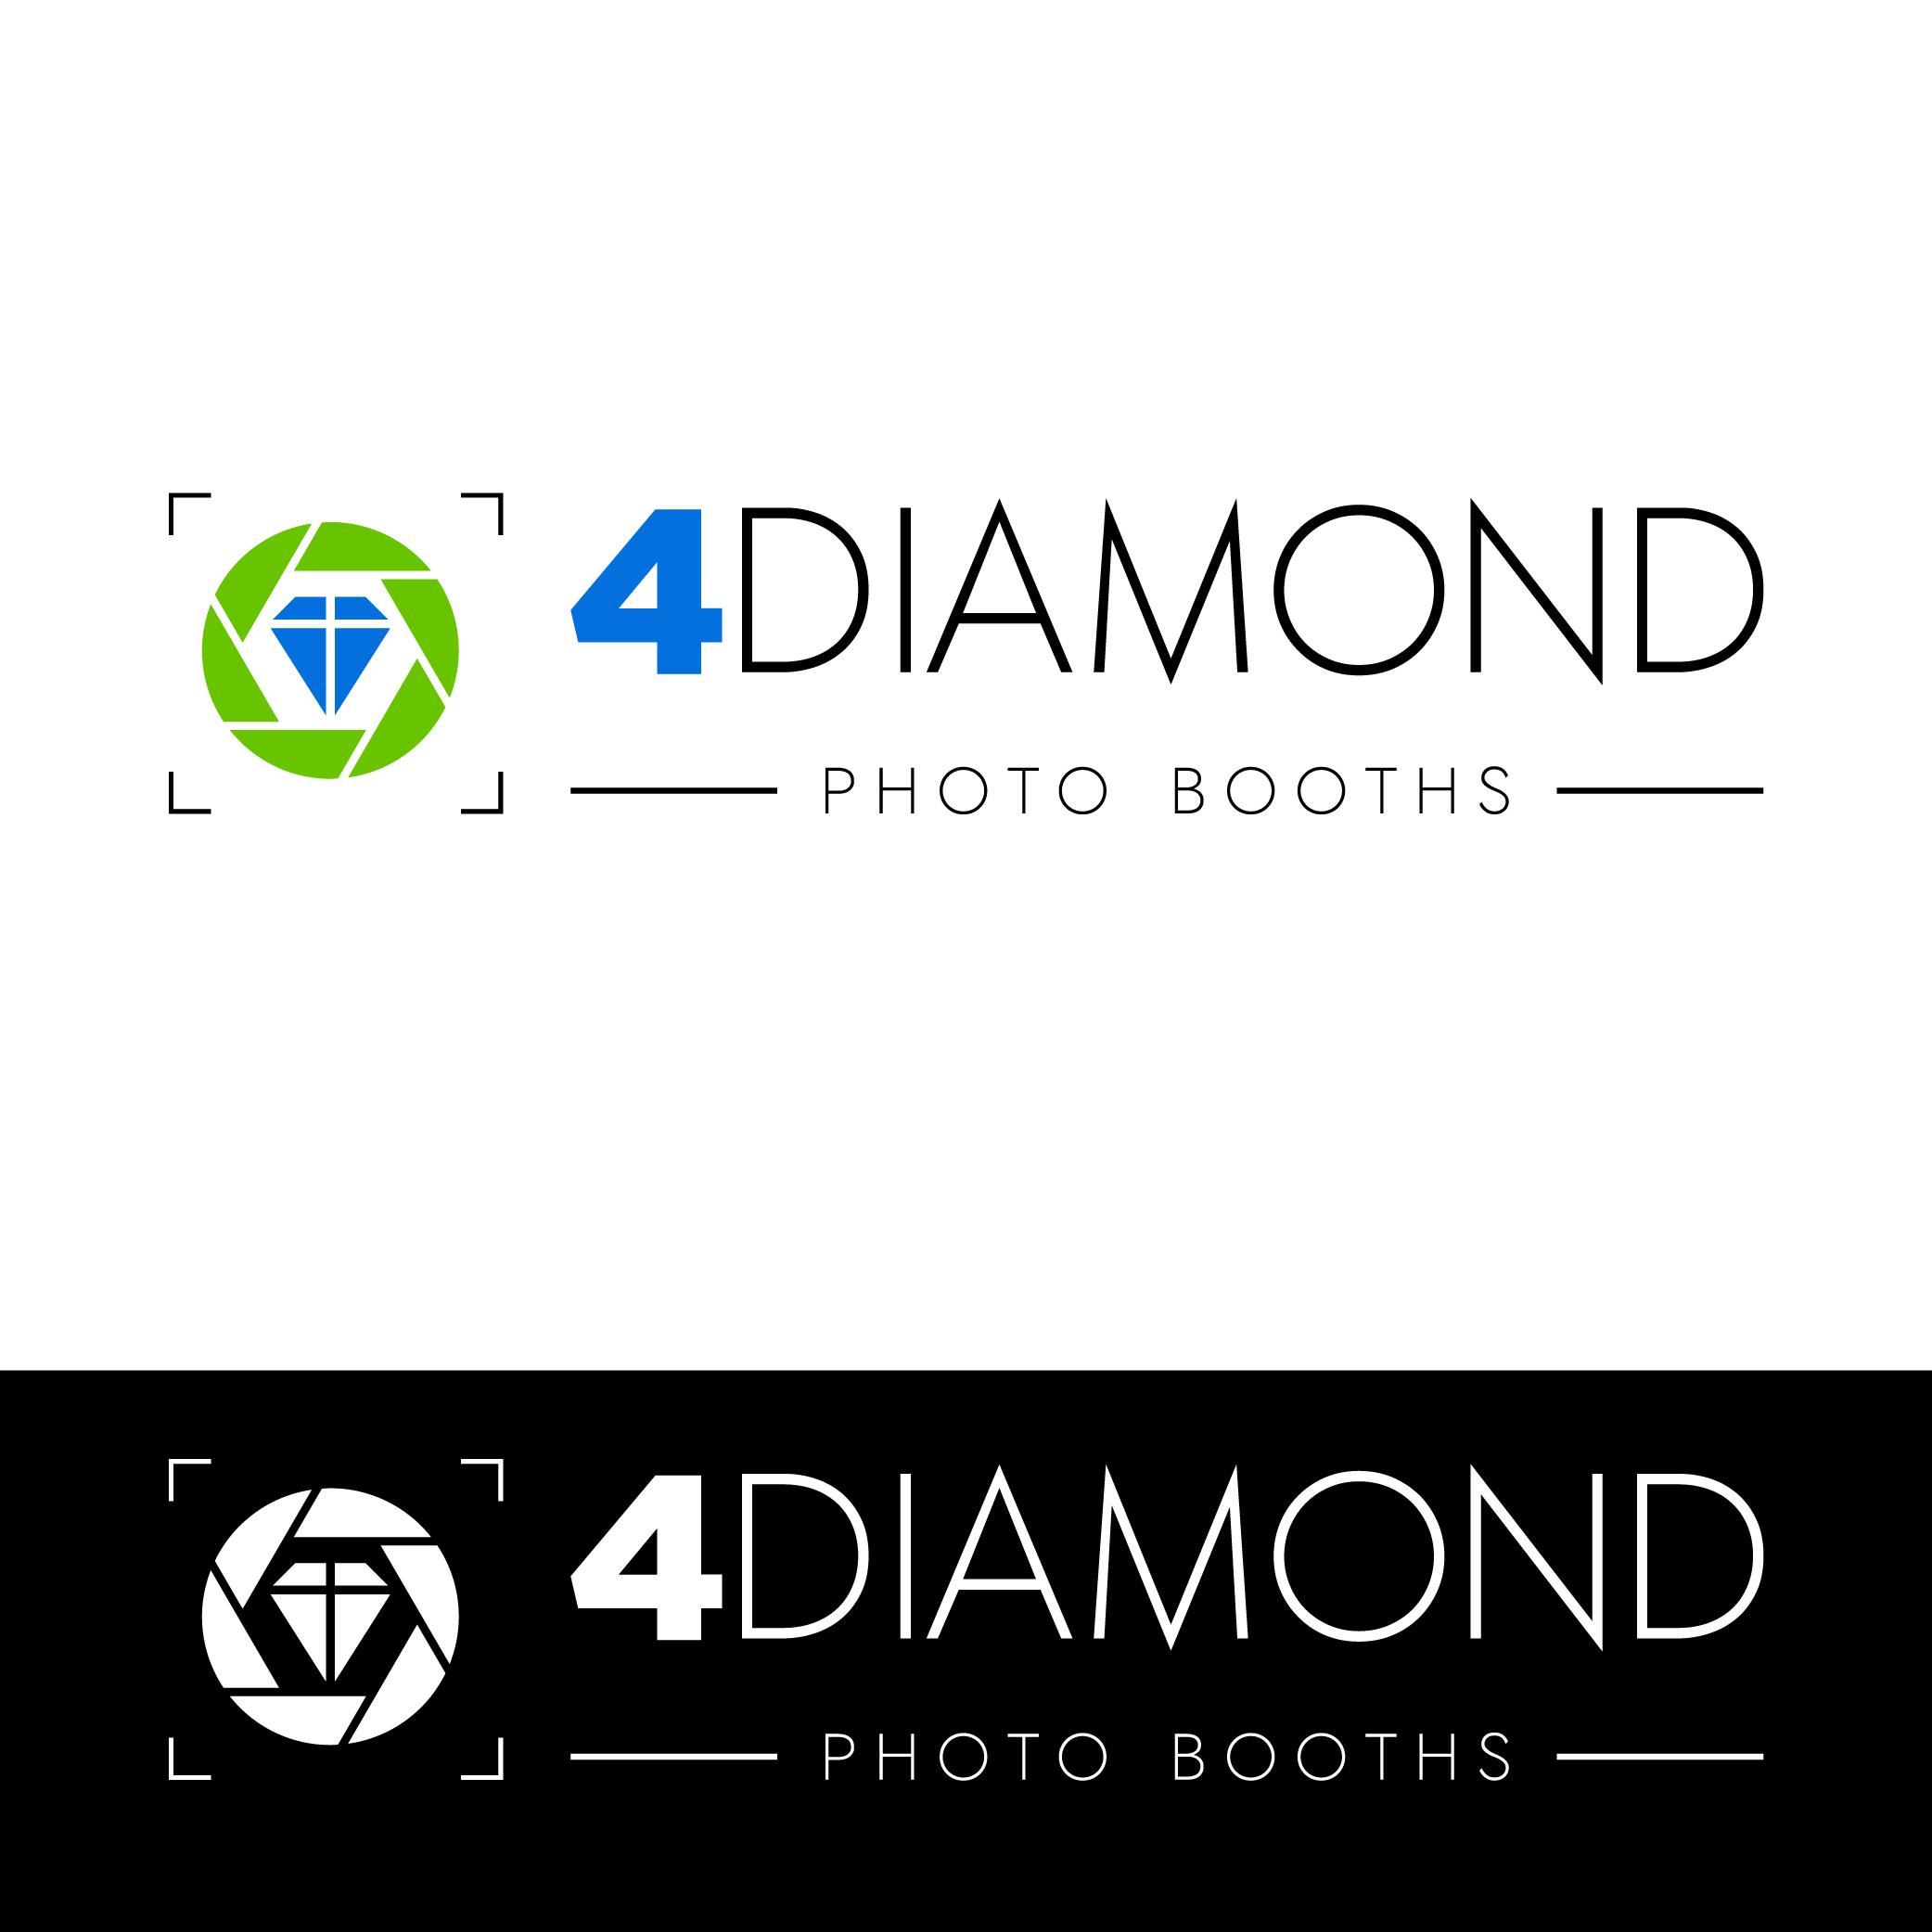 Logo Design by Private User - Entry No. 8 in the Logo Design Contest Creative Logo Design for 4 Diamond Photo Booths.